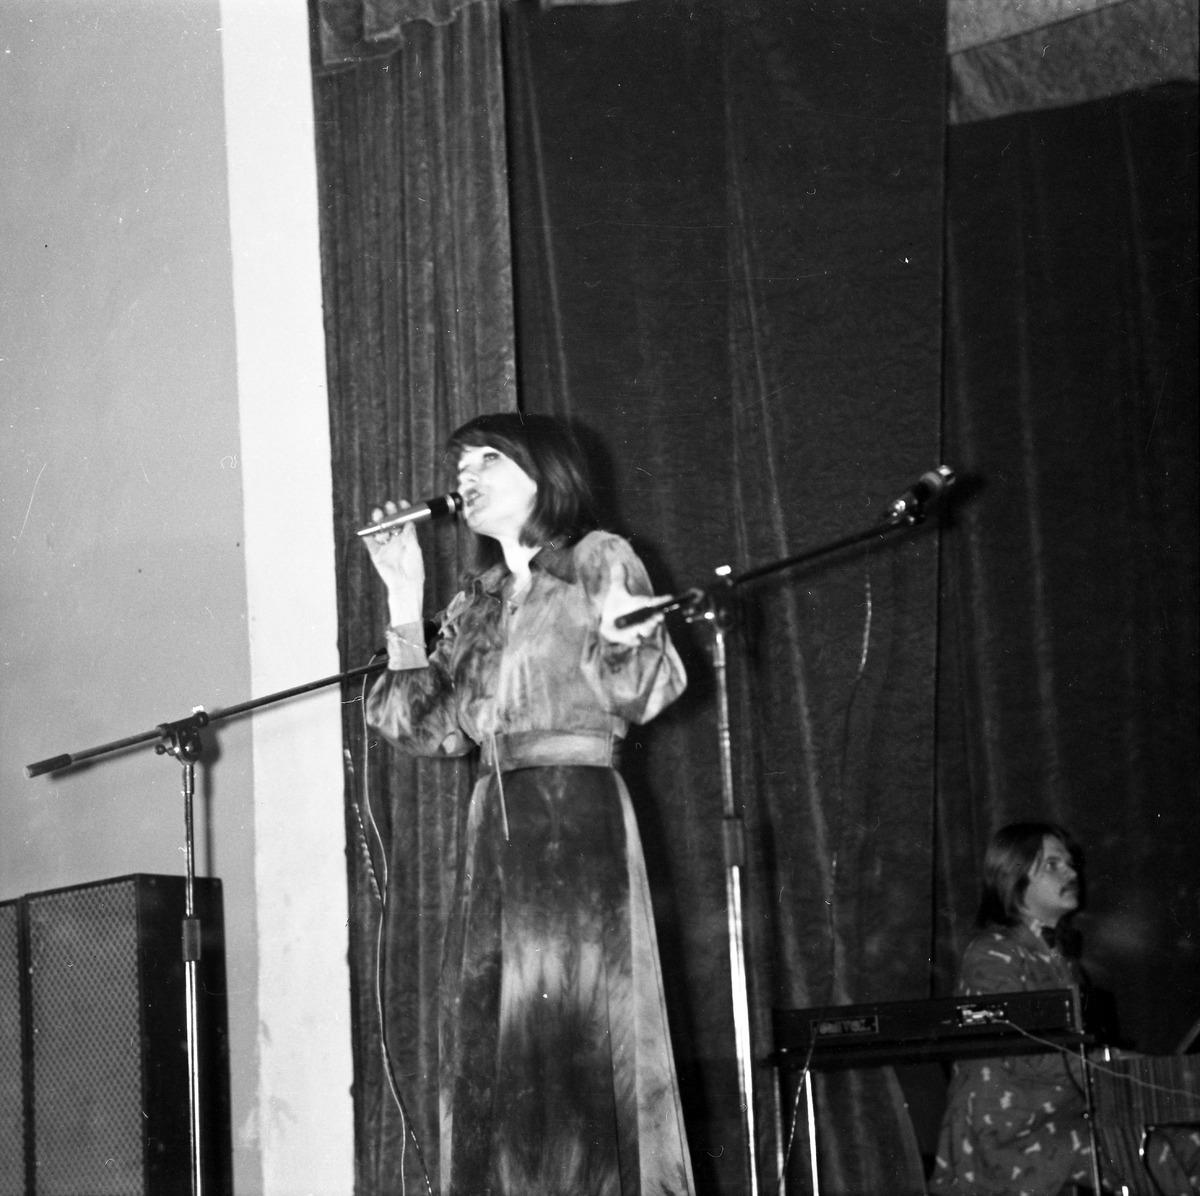 Koncert Teresy Tutinas i Waldemara Koconia, 1975 r.